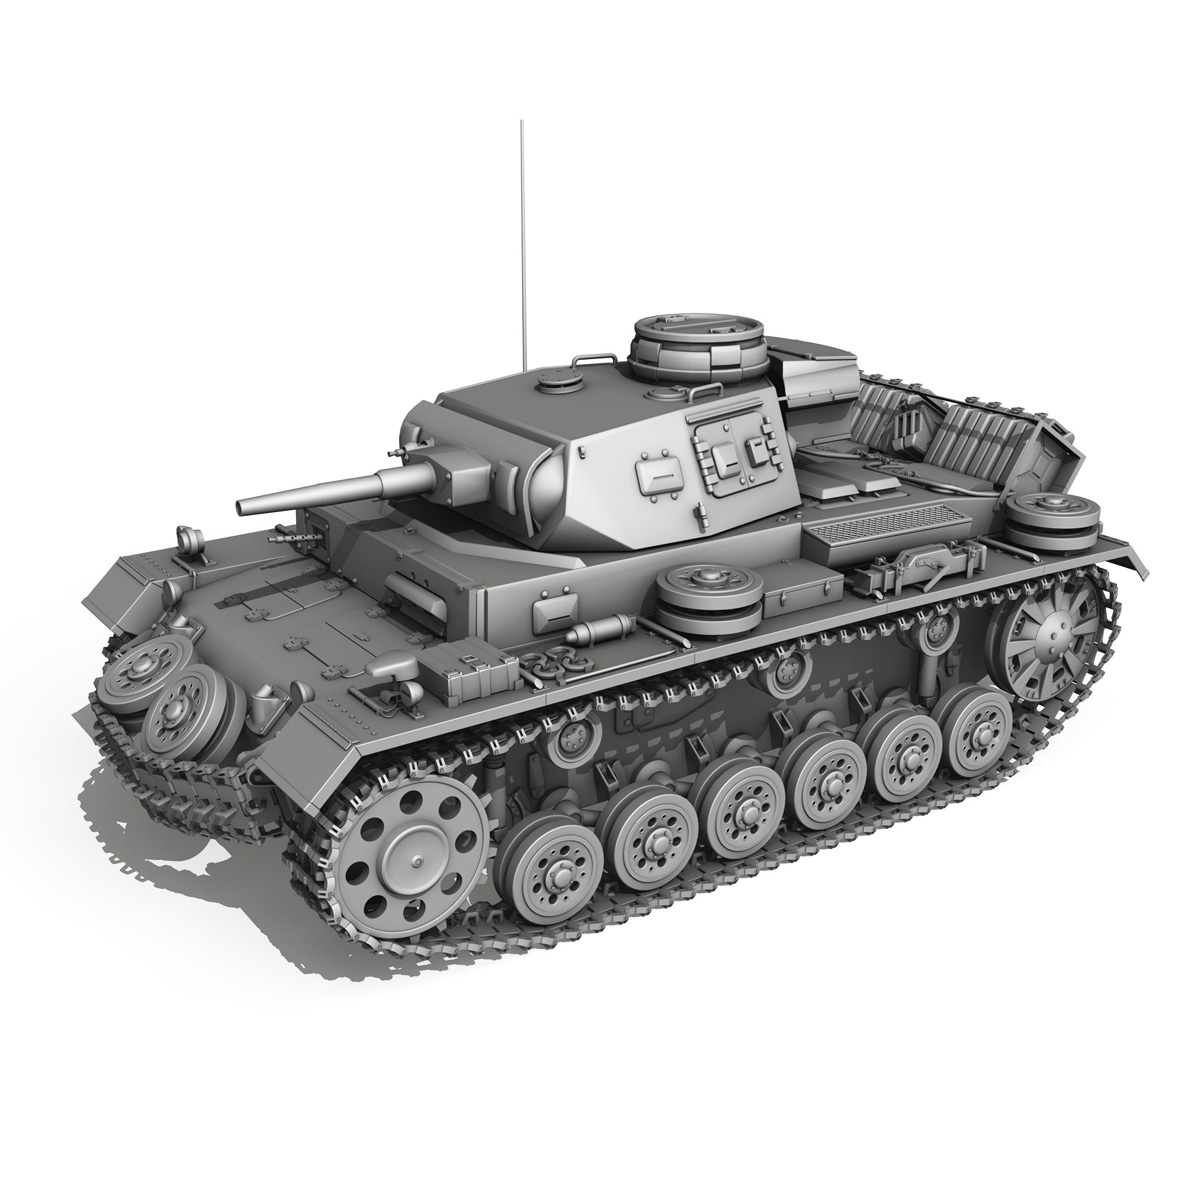 pzkpfw iii – panzer 3 – ausf.g – dak – 211 3d model 3ds c4d fbx lwo lw lws obj 266473